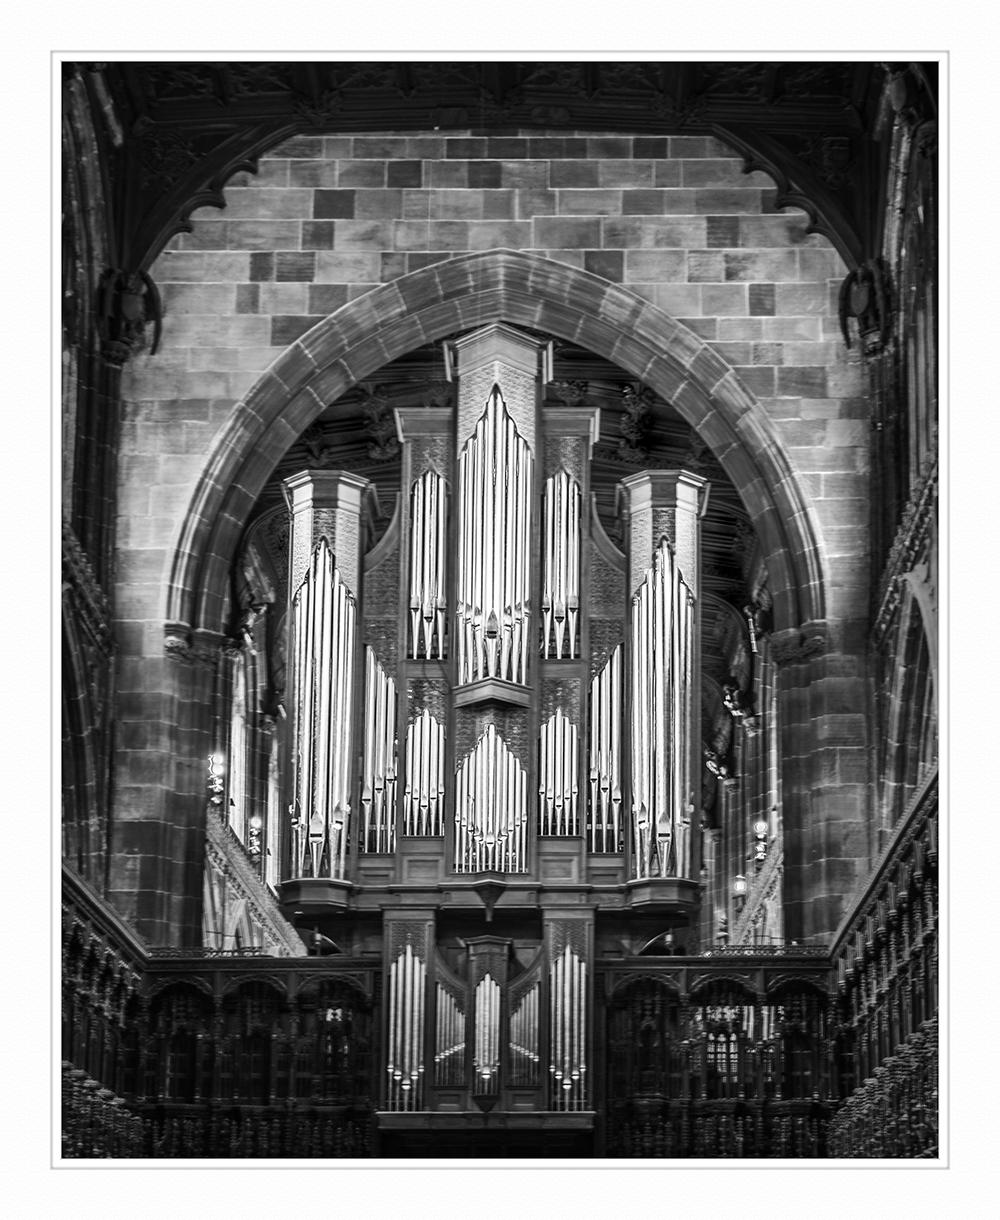 _MG_4847-HDR Manchester Cathedral organ